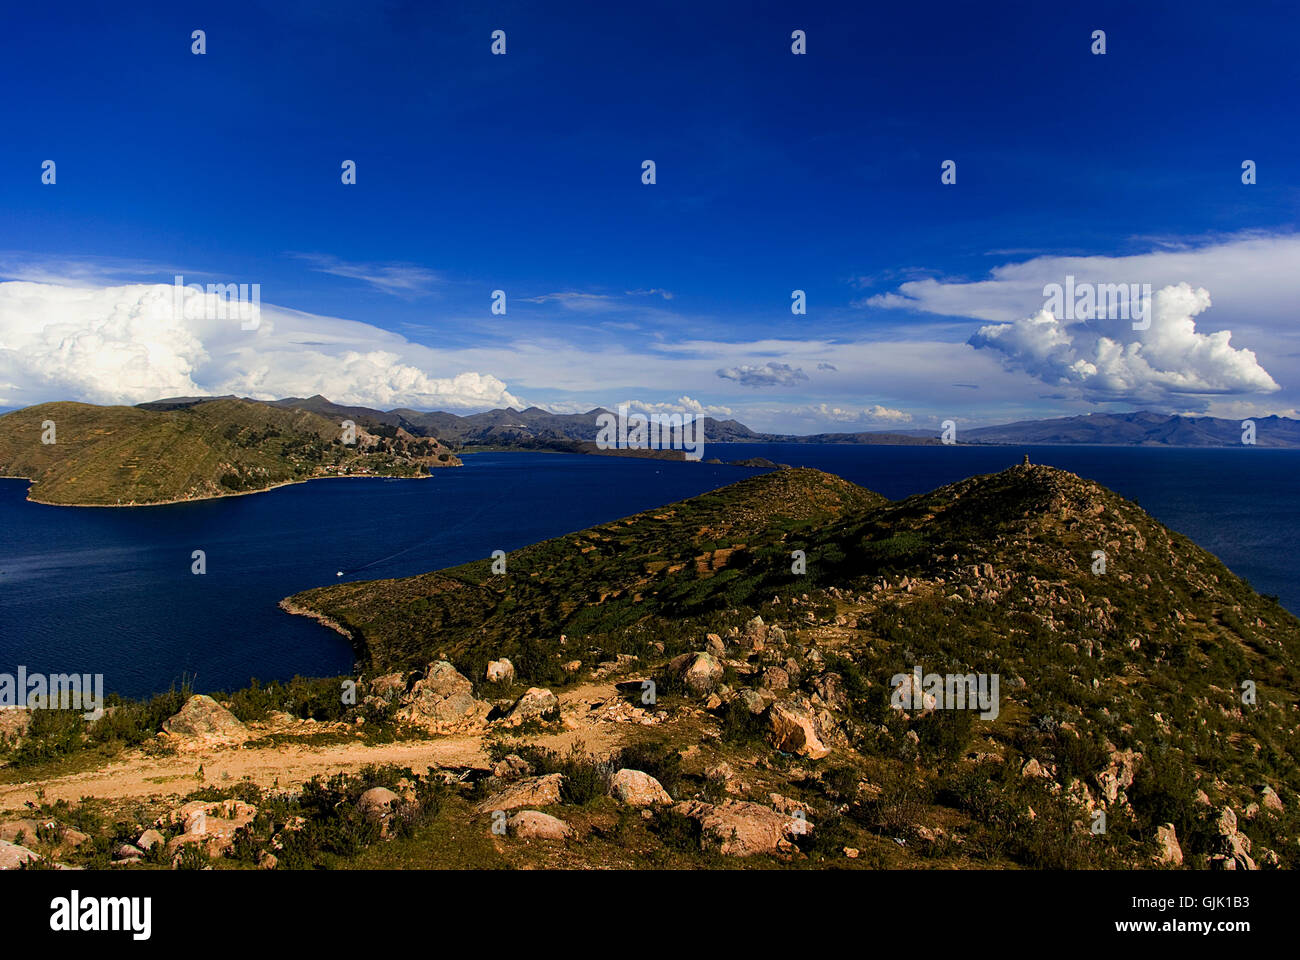 lake titicaca - Stock Image